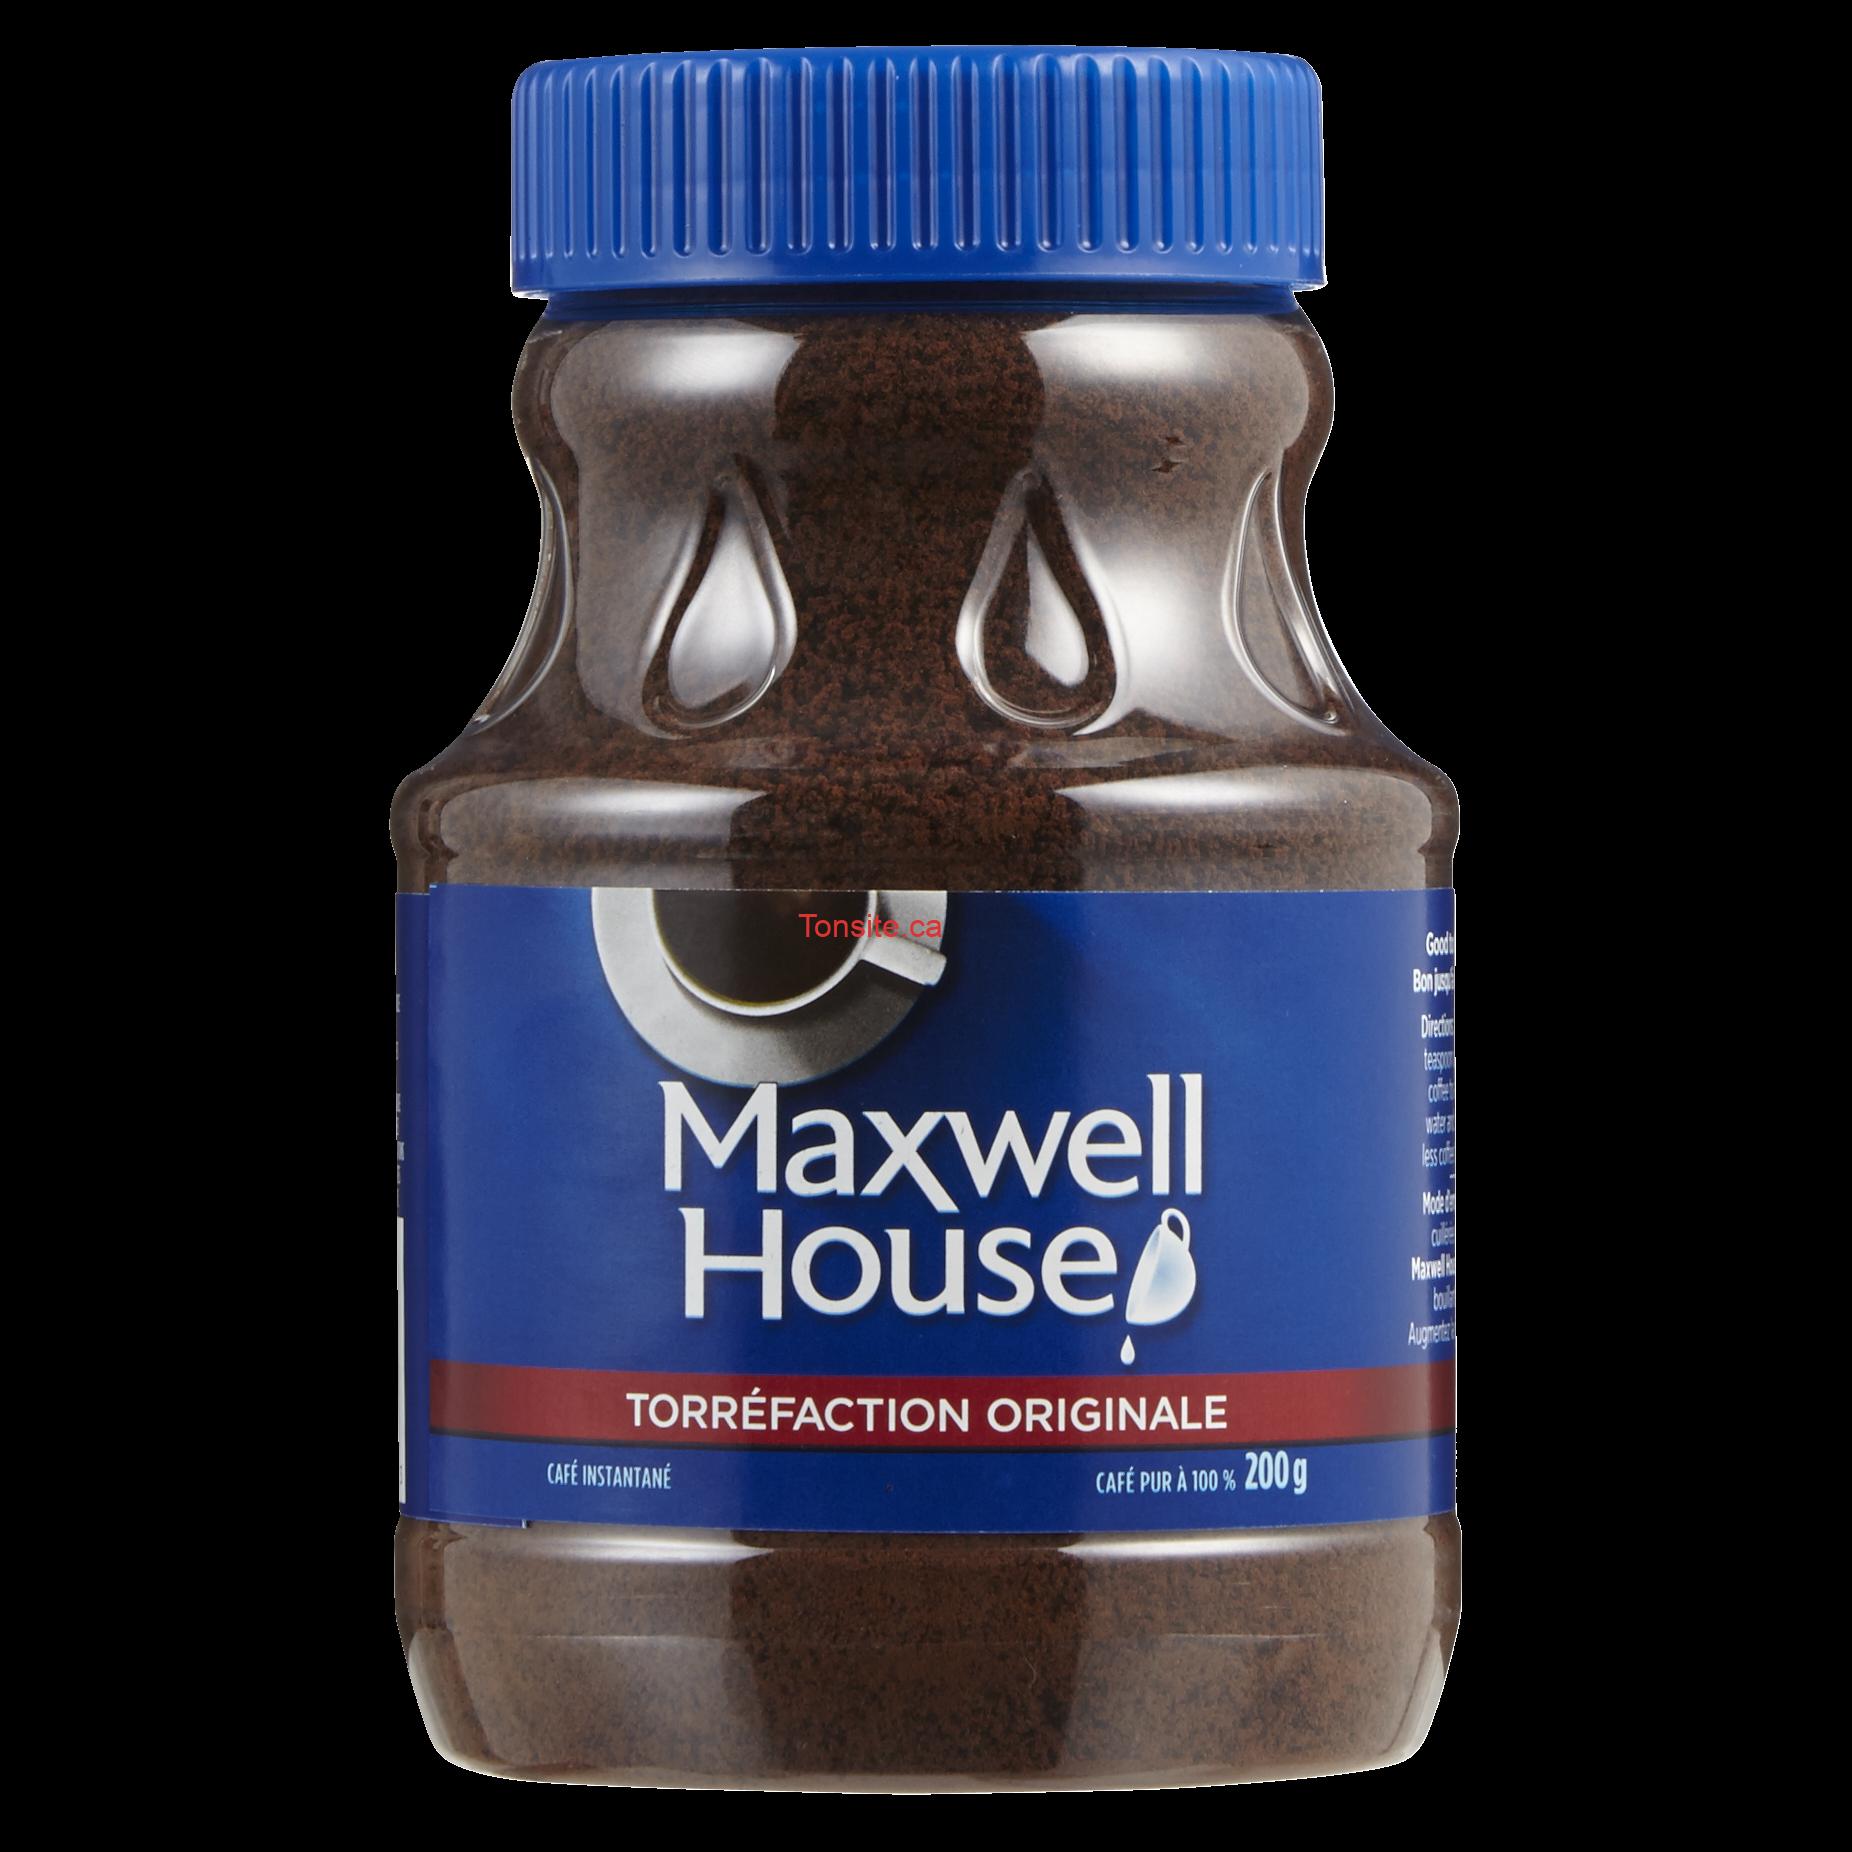 maxwel-house